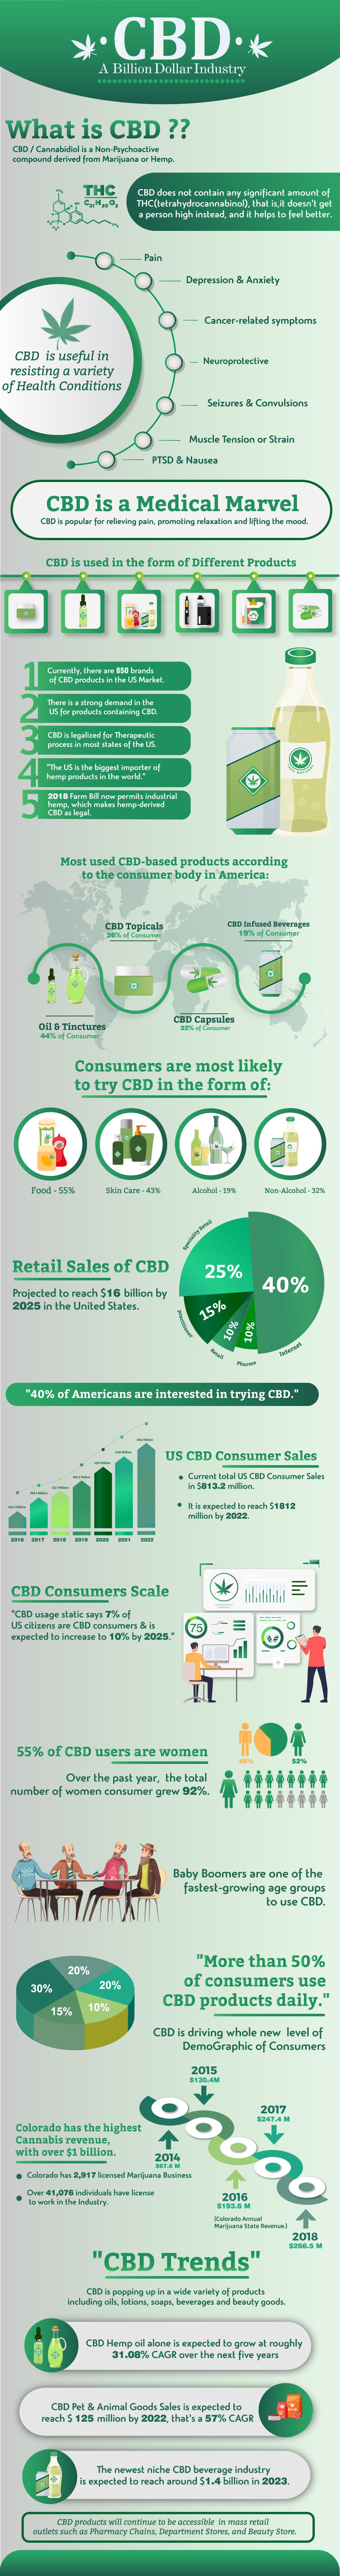 CBD A Billion Dollar Industry